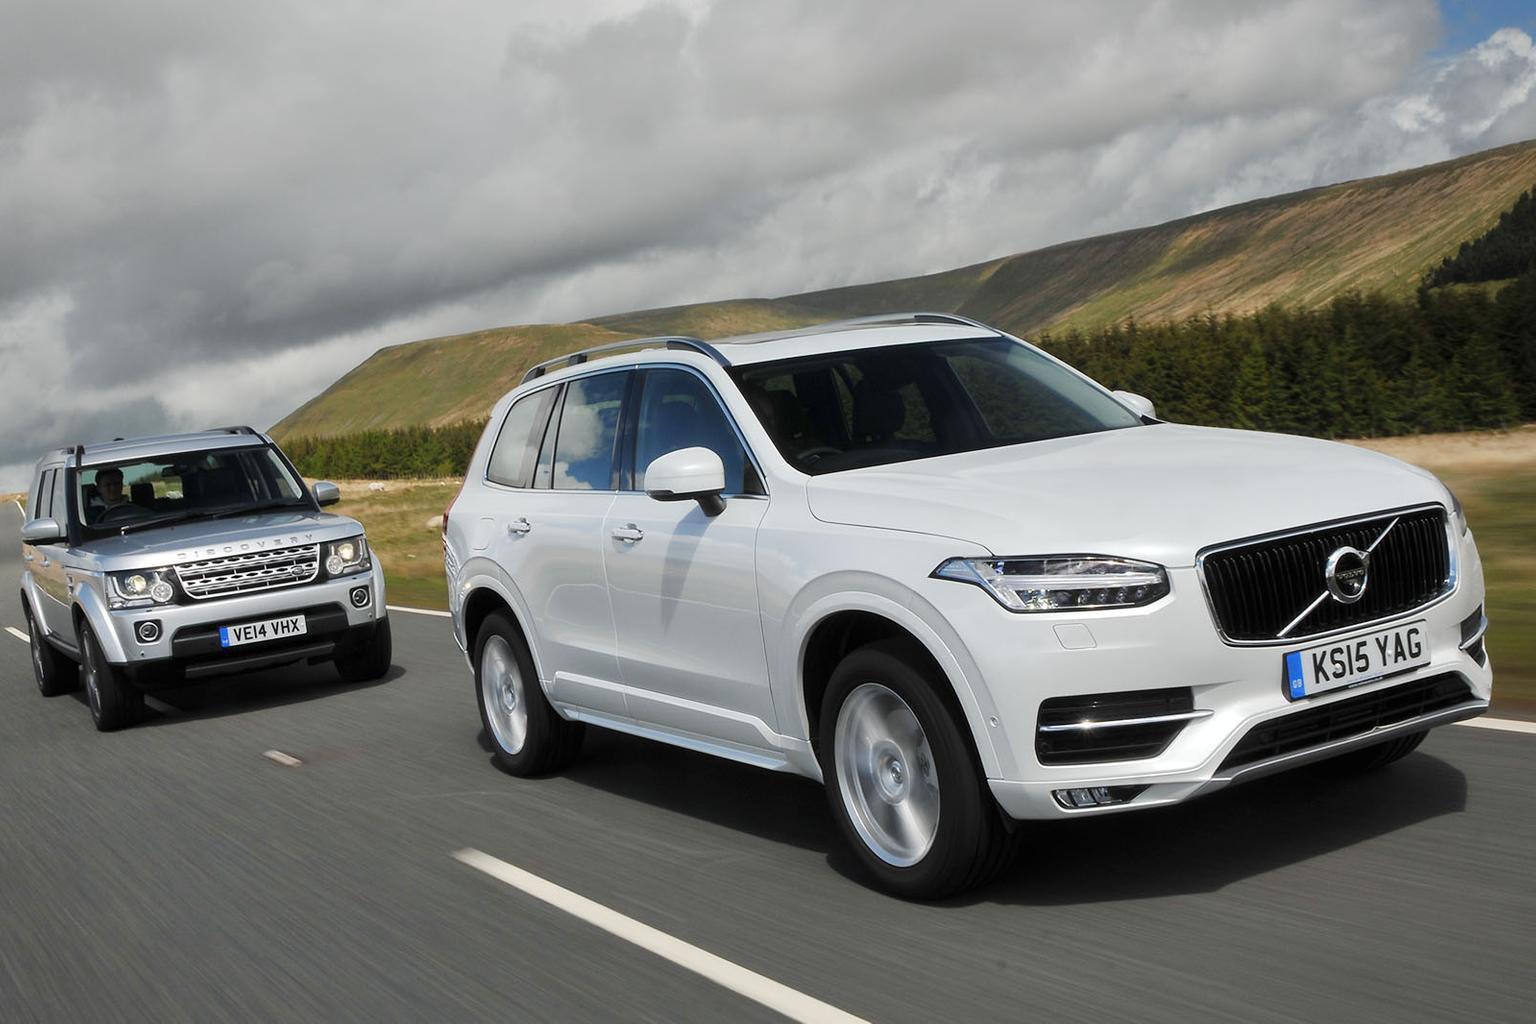 Volvo XC90 vs BMW X5 vs Land Rover Discovery